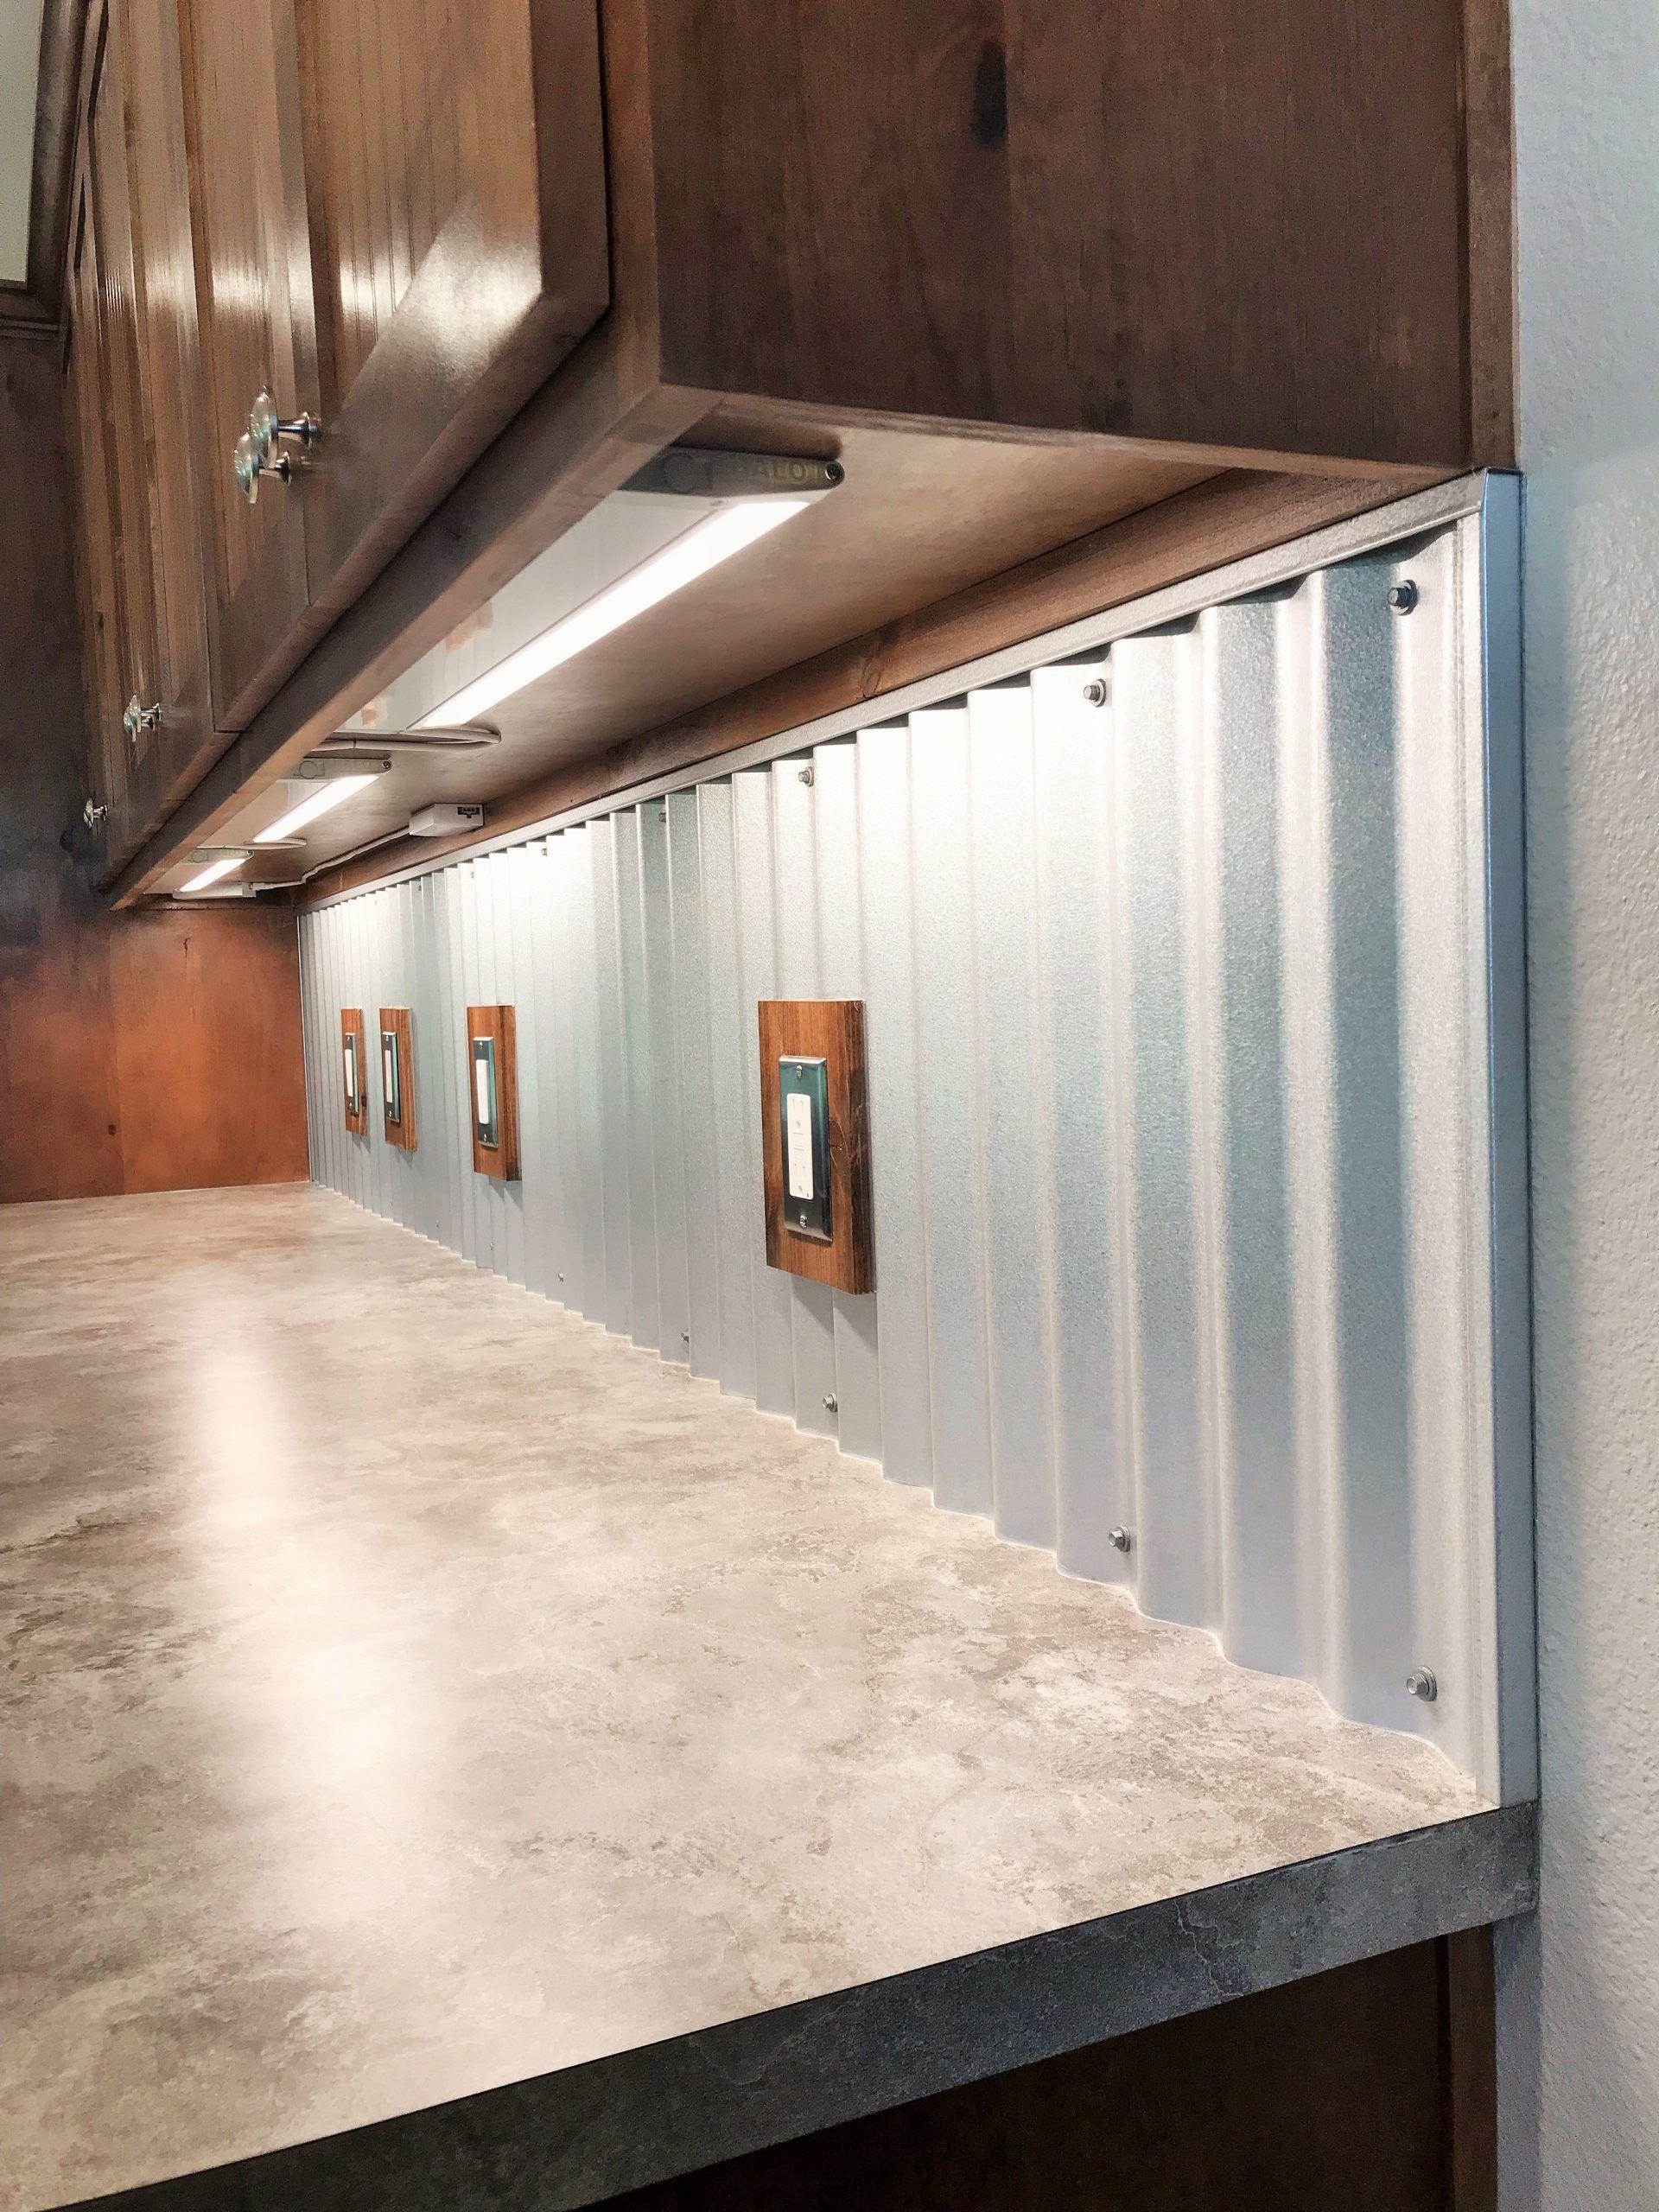 Corrugated Metal Backsplash Backsplash Corrugated Metal In 2020 Glass Backsplash Kitchen Metallic Backsplash Metal Backsplash Kitchen